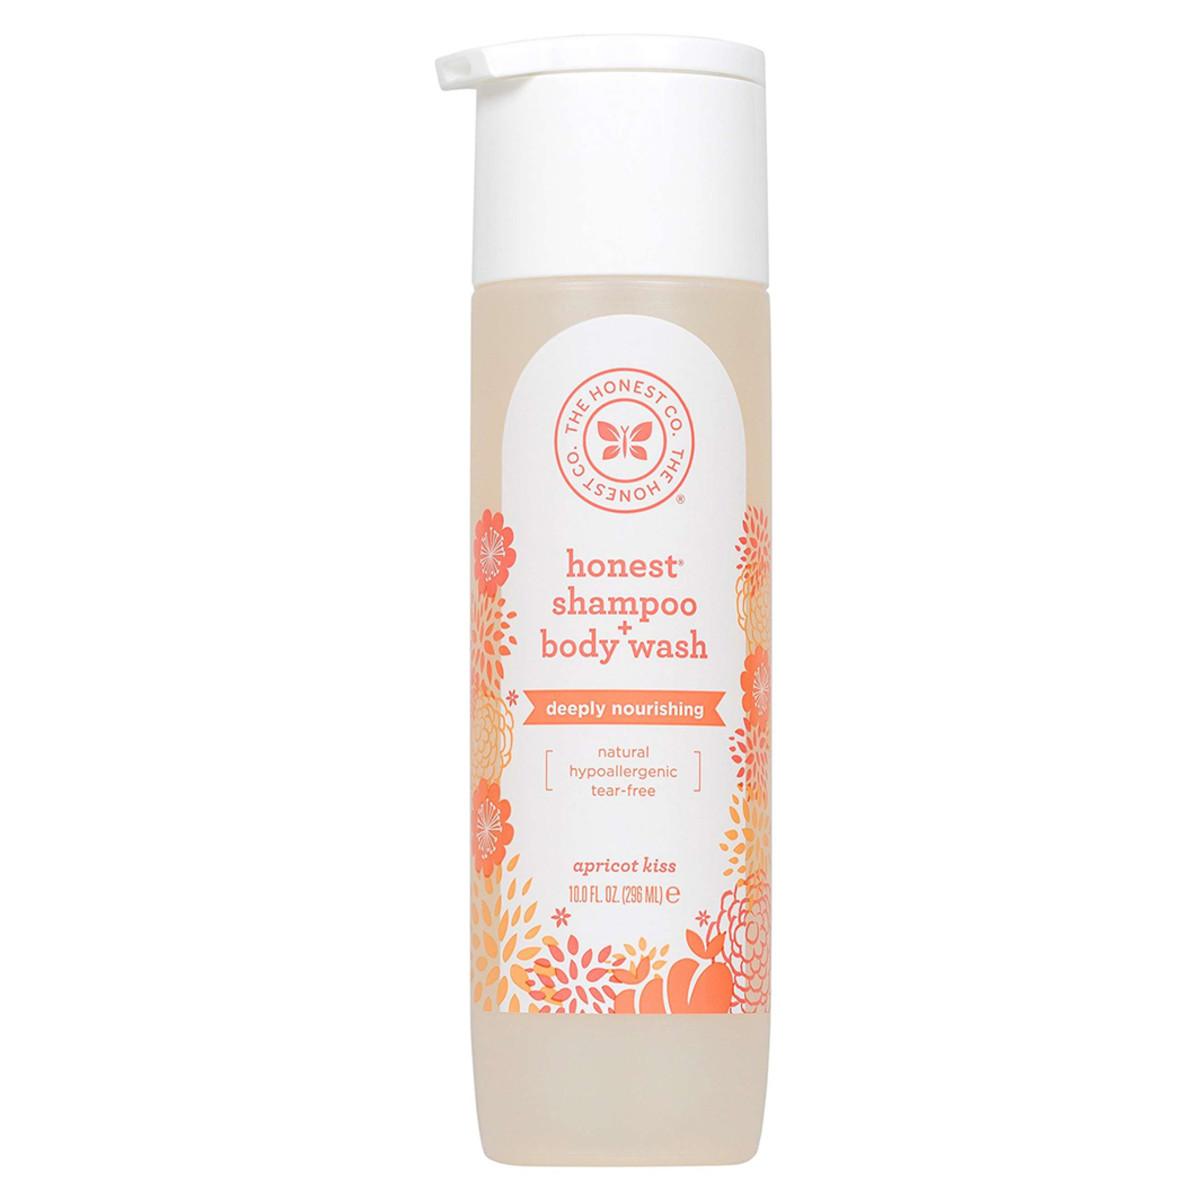 The Honest Company Honest Shampoo and Body Wash